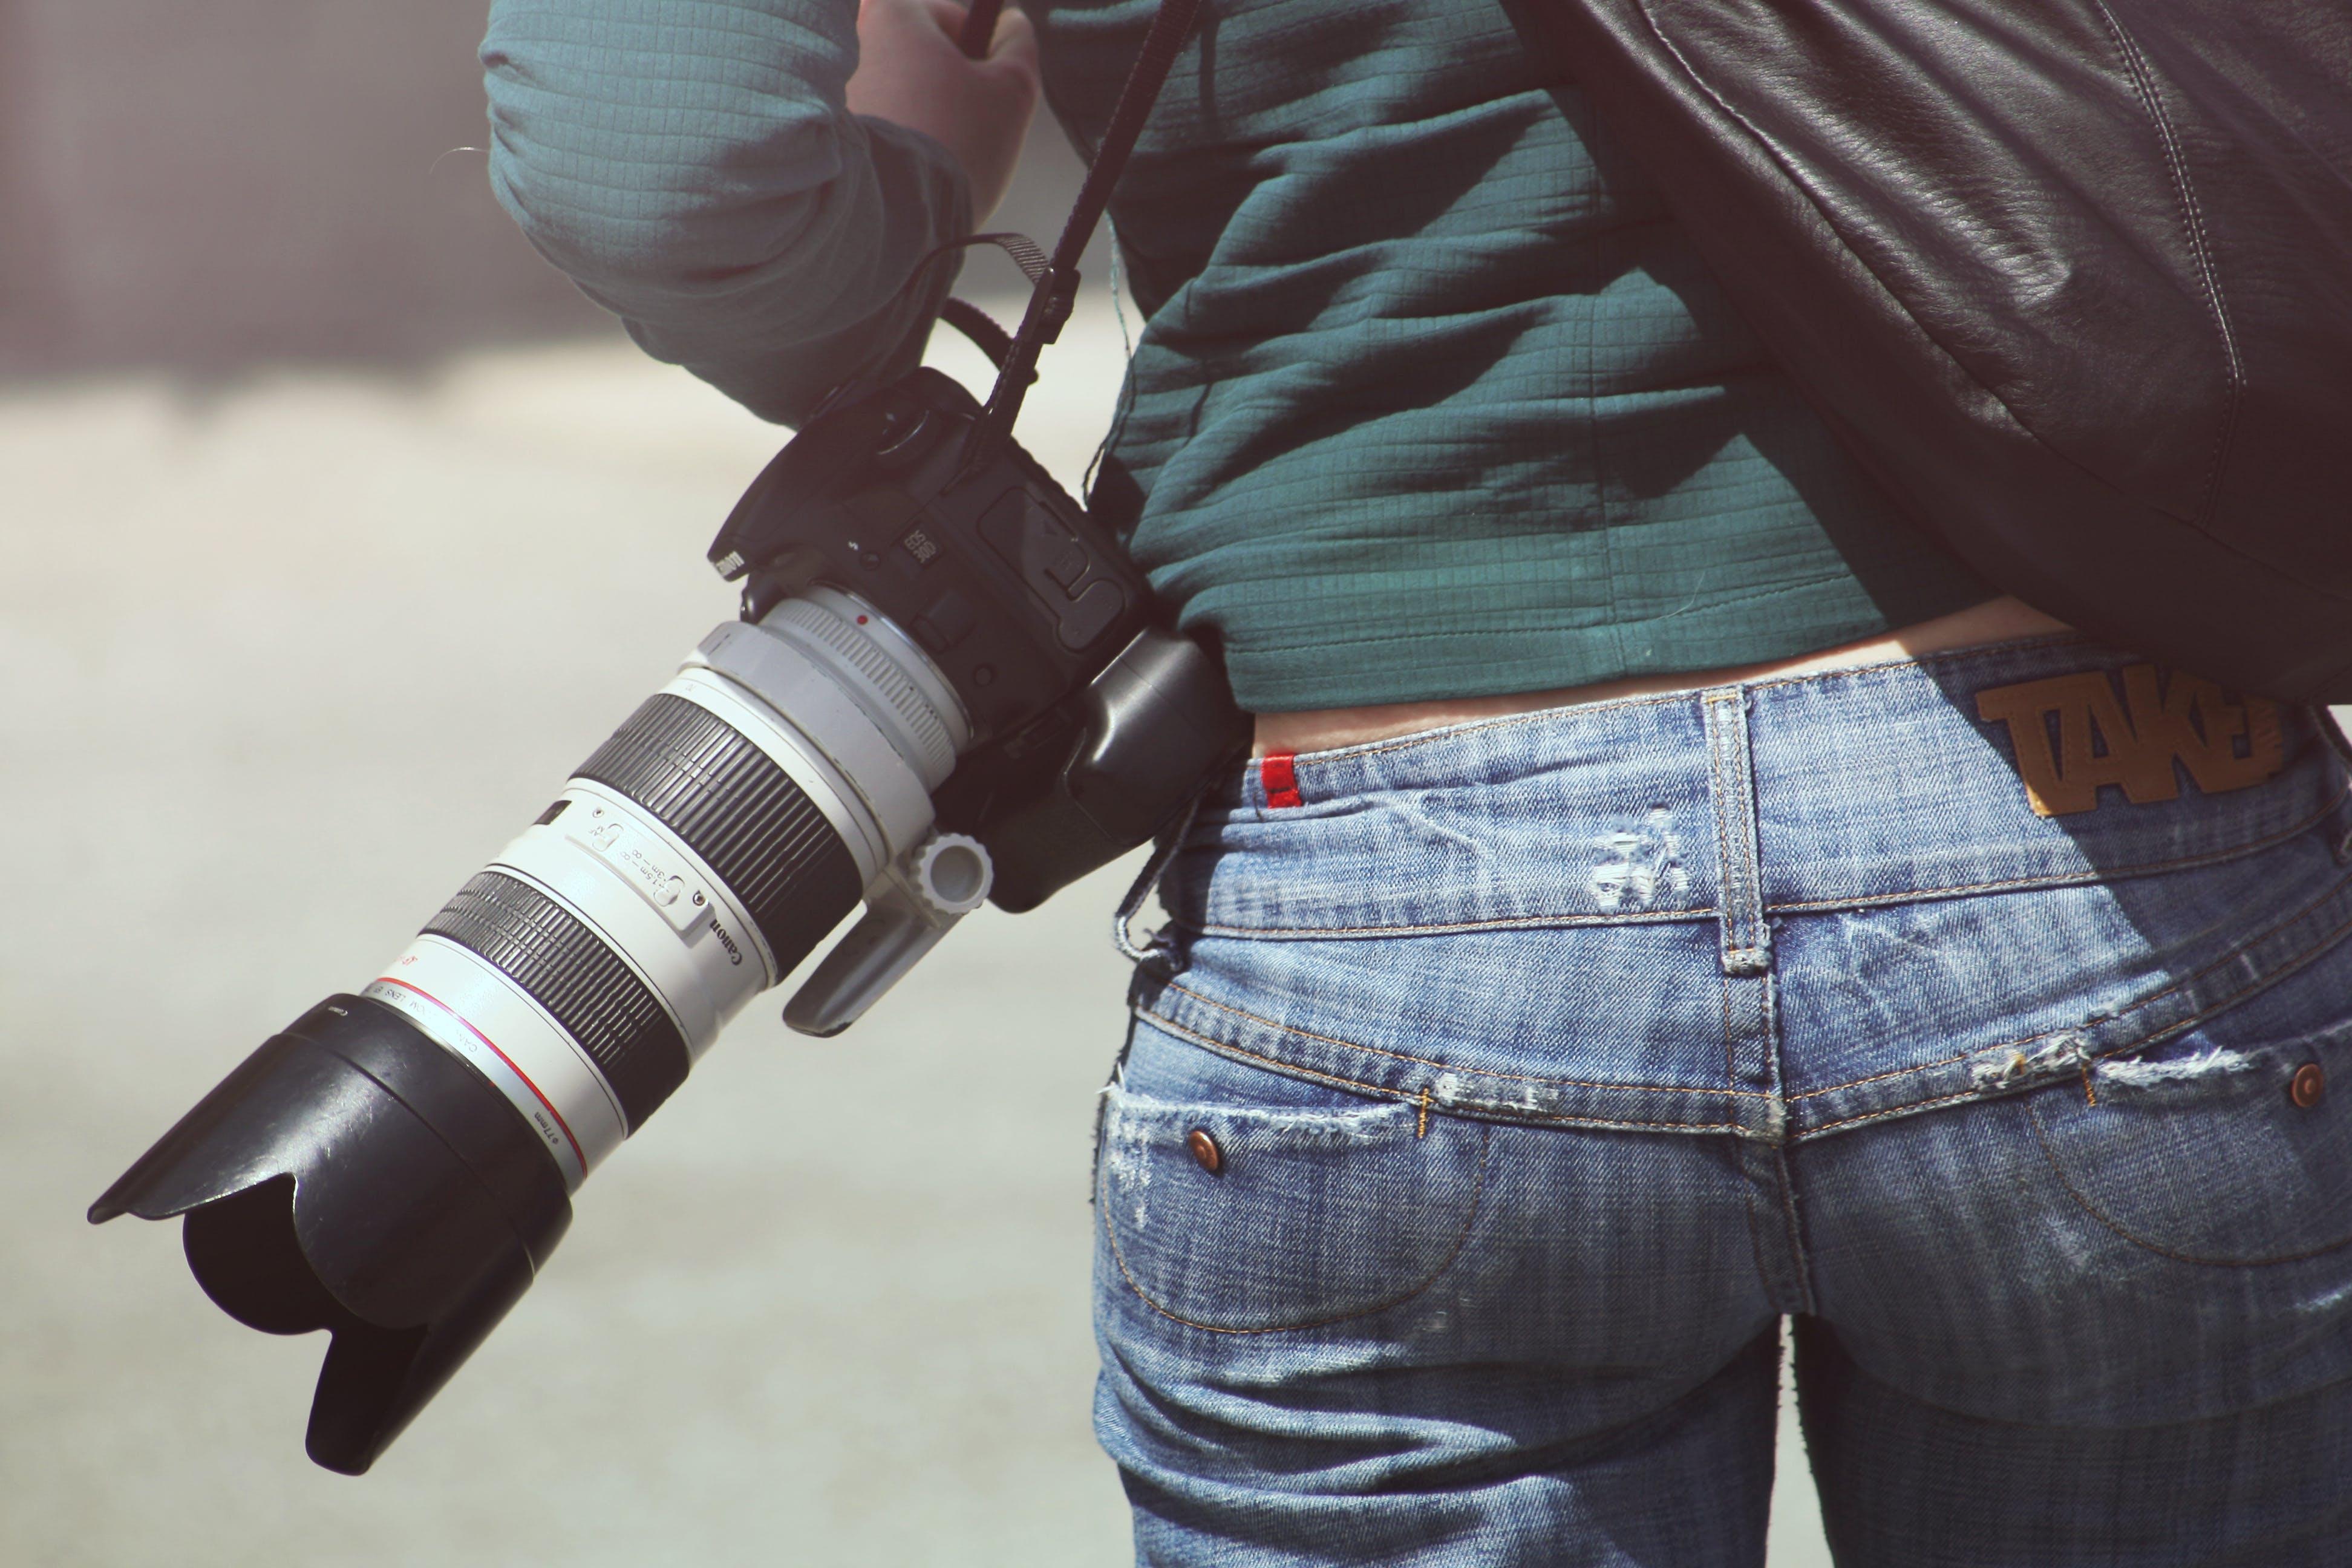 Fotobanka sbezplatnými fotkami na tému Canon, chrbát, človek, fotoaparát